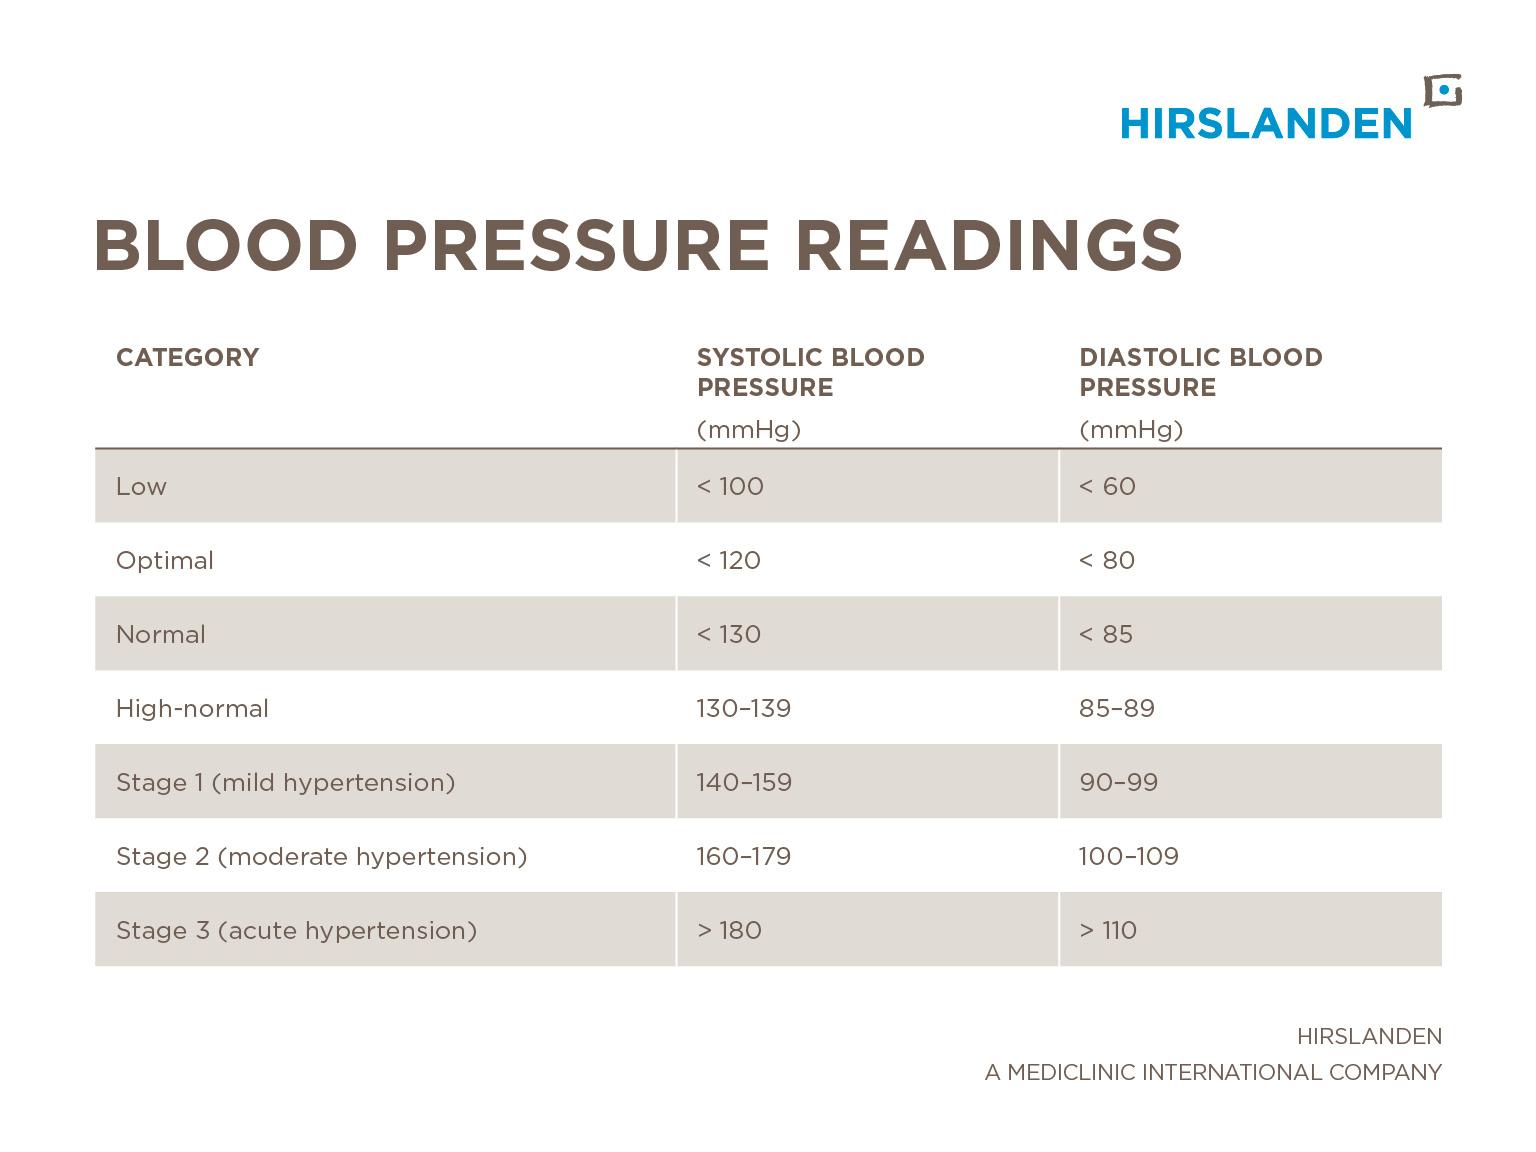 Blood pressure and blood pressure readings explained   Hirslanden